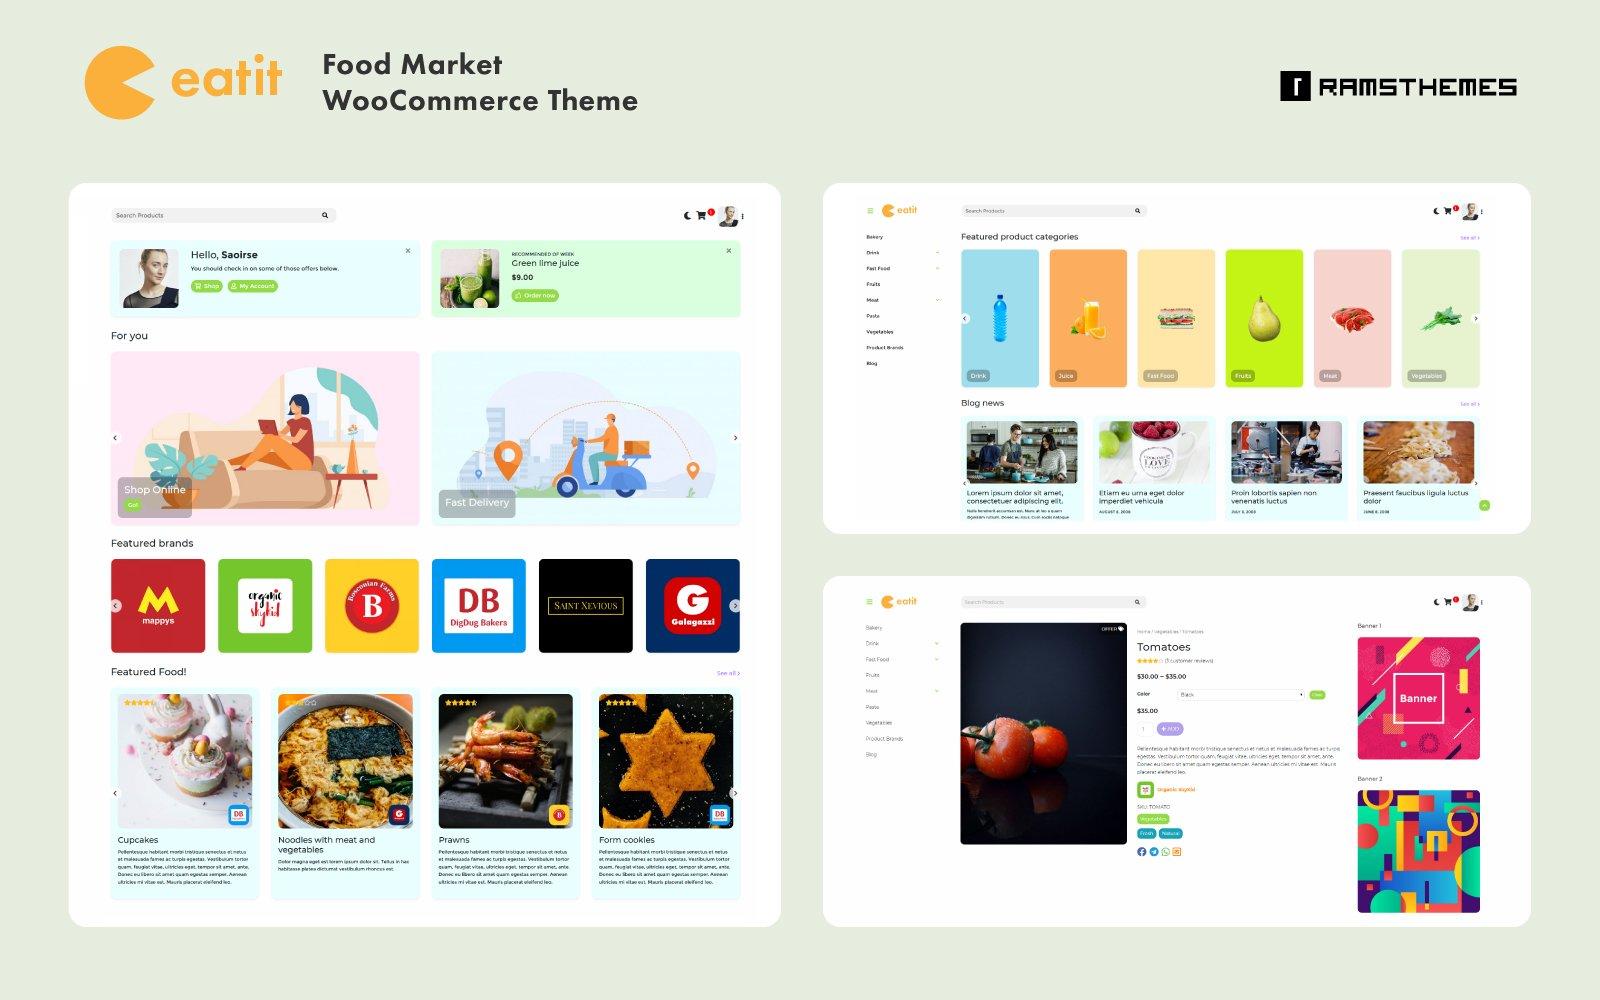 EATIT - Food Market WooCommerce Theme